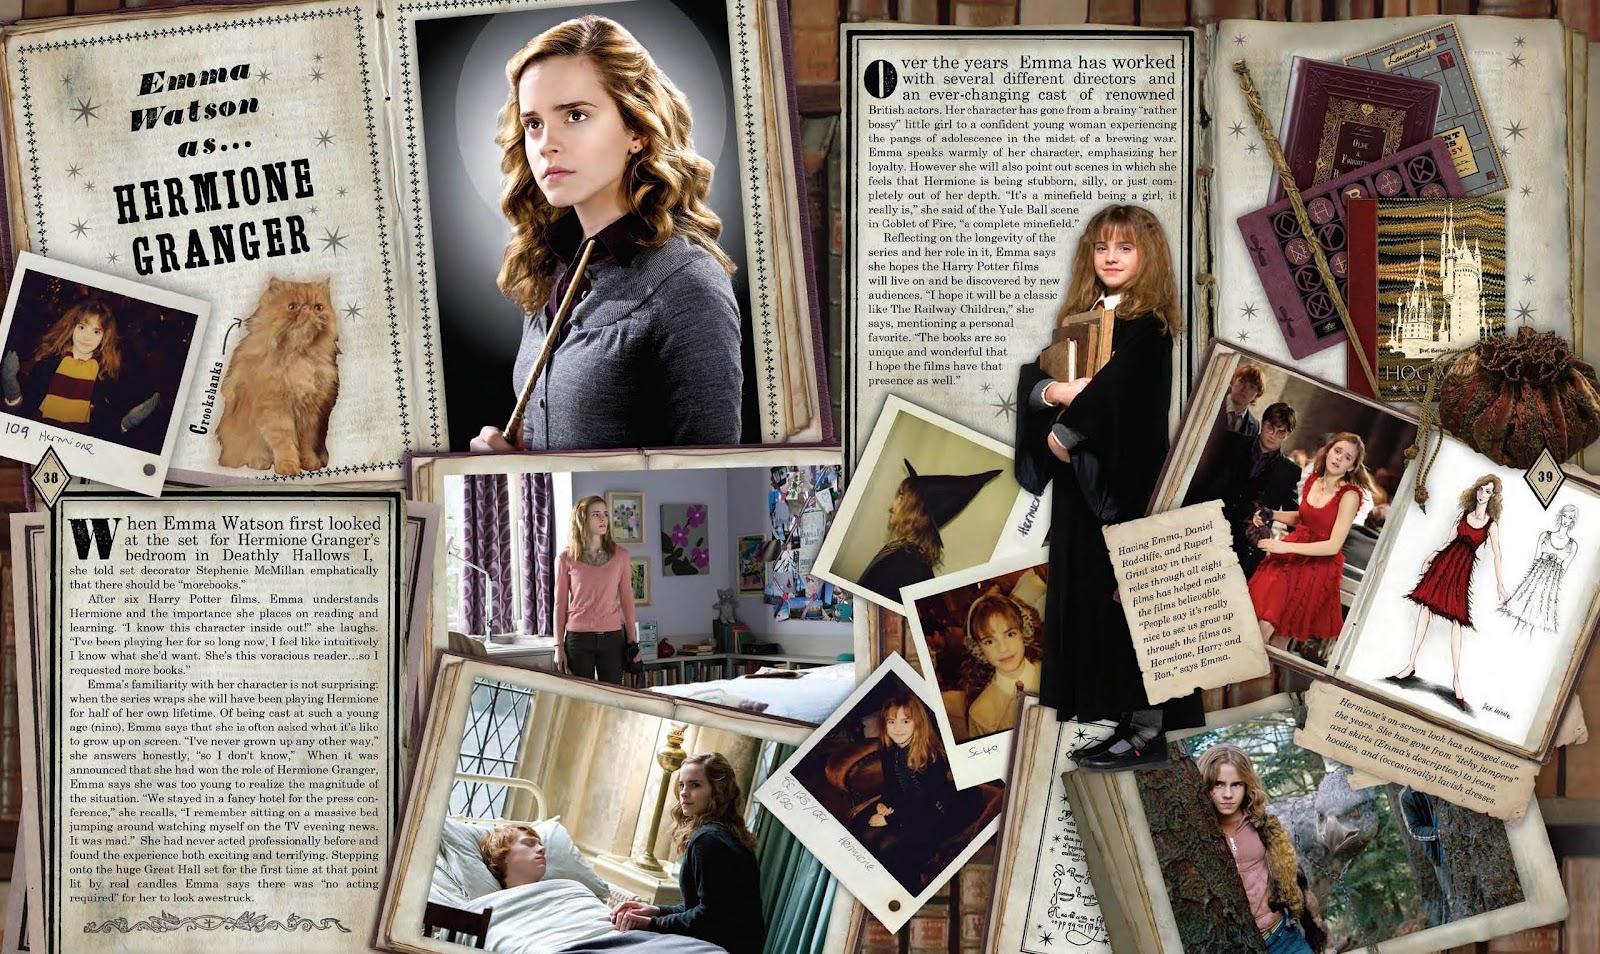 http://2.bp.blogspot.com/-BJ-oex3mF9Q/UAXwDtcMmMI/AAAAAAAAAI4/Ri24hQmtVWw/s1600/Harry-Potter-Film-Wizardry-rupert-grint-11229085-2560-1527.jpg